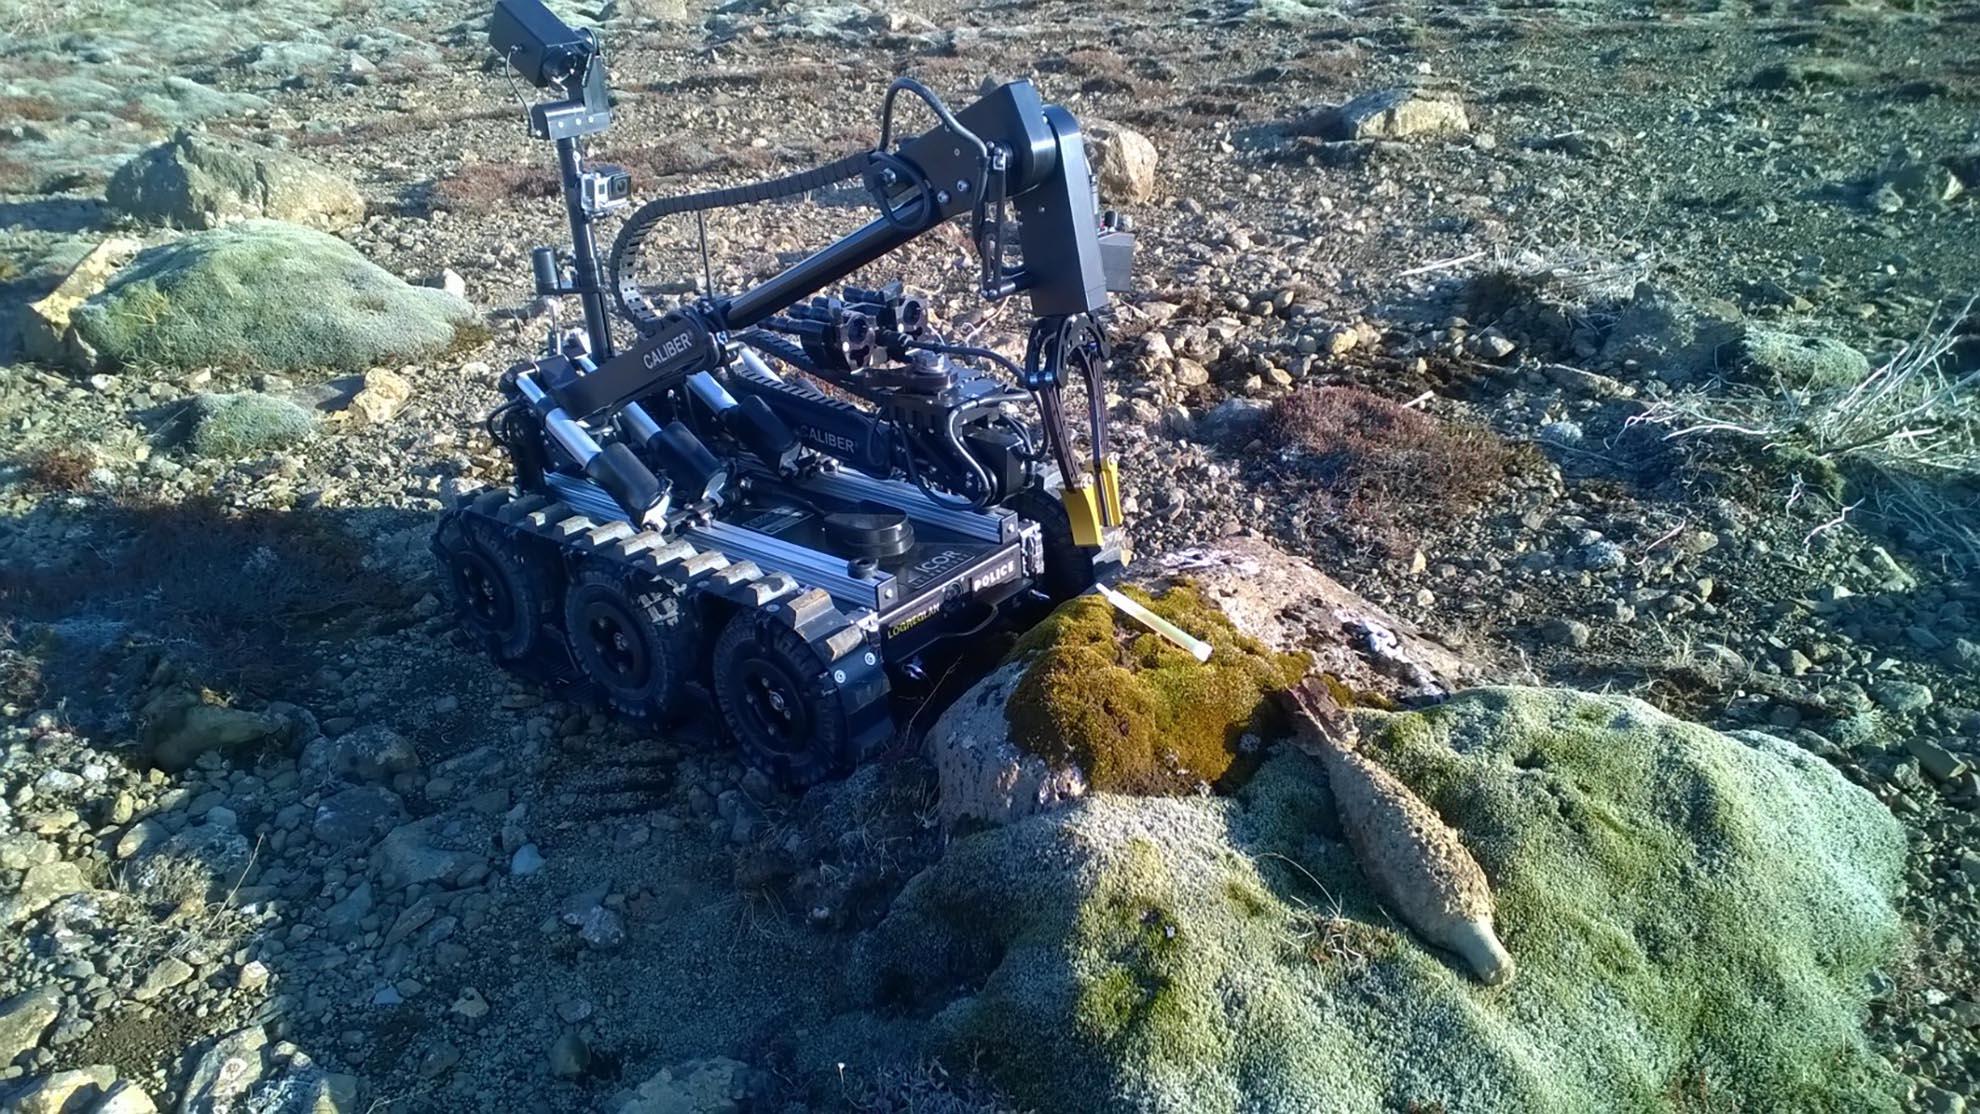 mk3-caliber-eod-robot-inspect-old-bomb